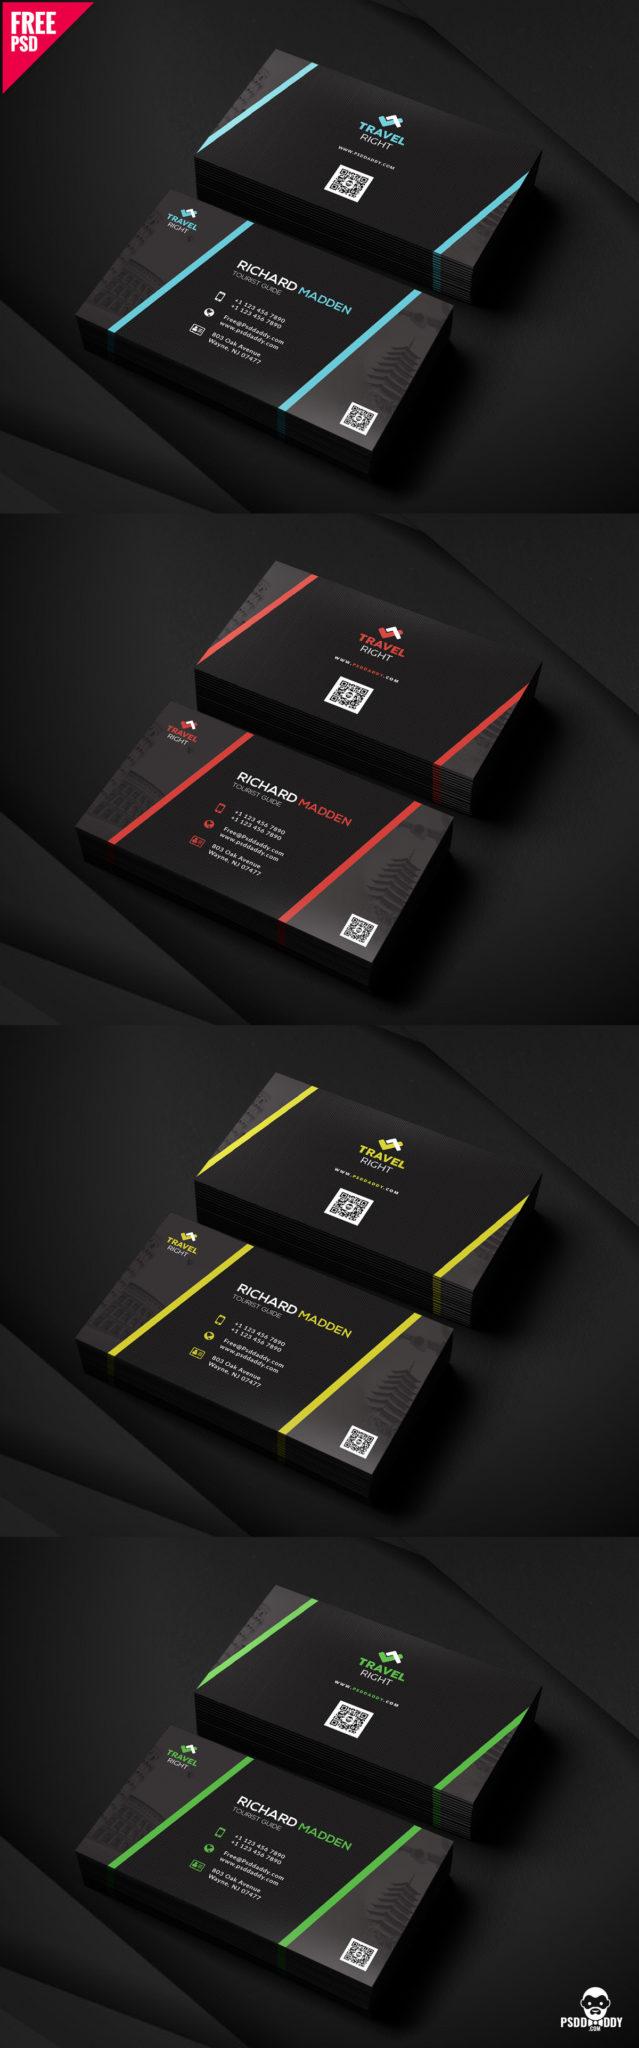 Download business card bundle free psd psddaddy business card design business card design templates business card dimensions business card holder colourmoves